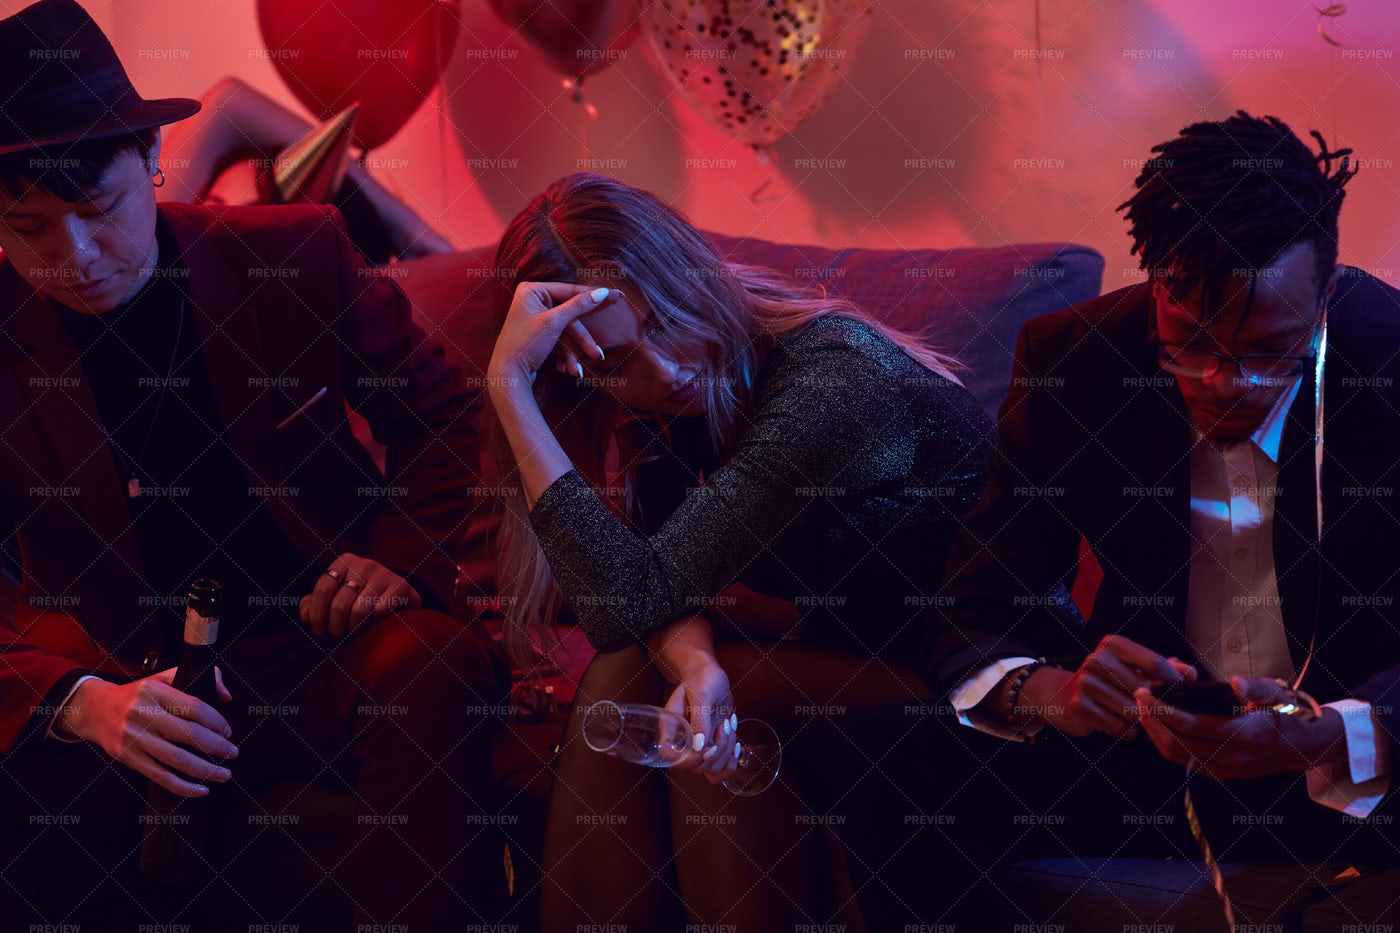 Drunk Woman In Nightclub: Stock Photos